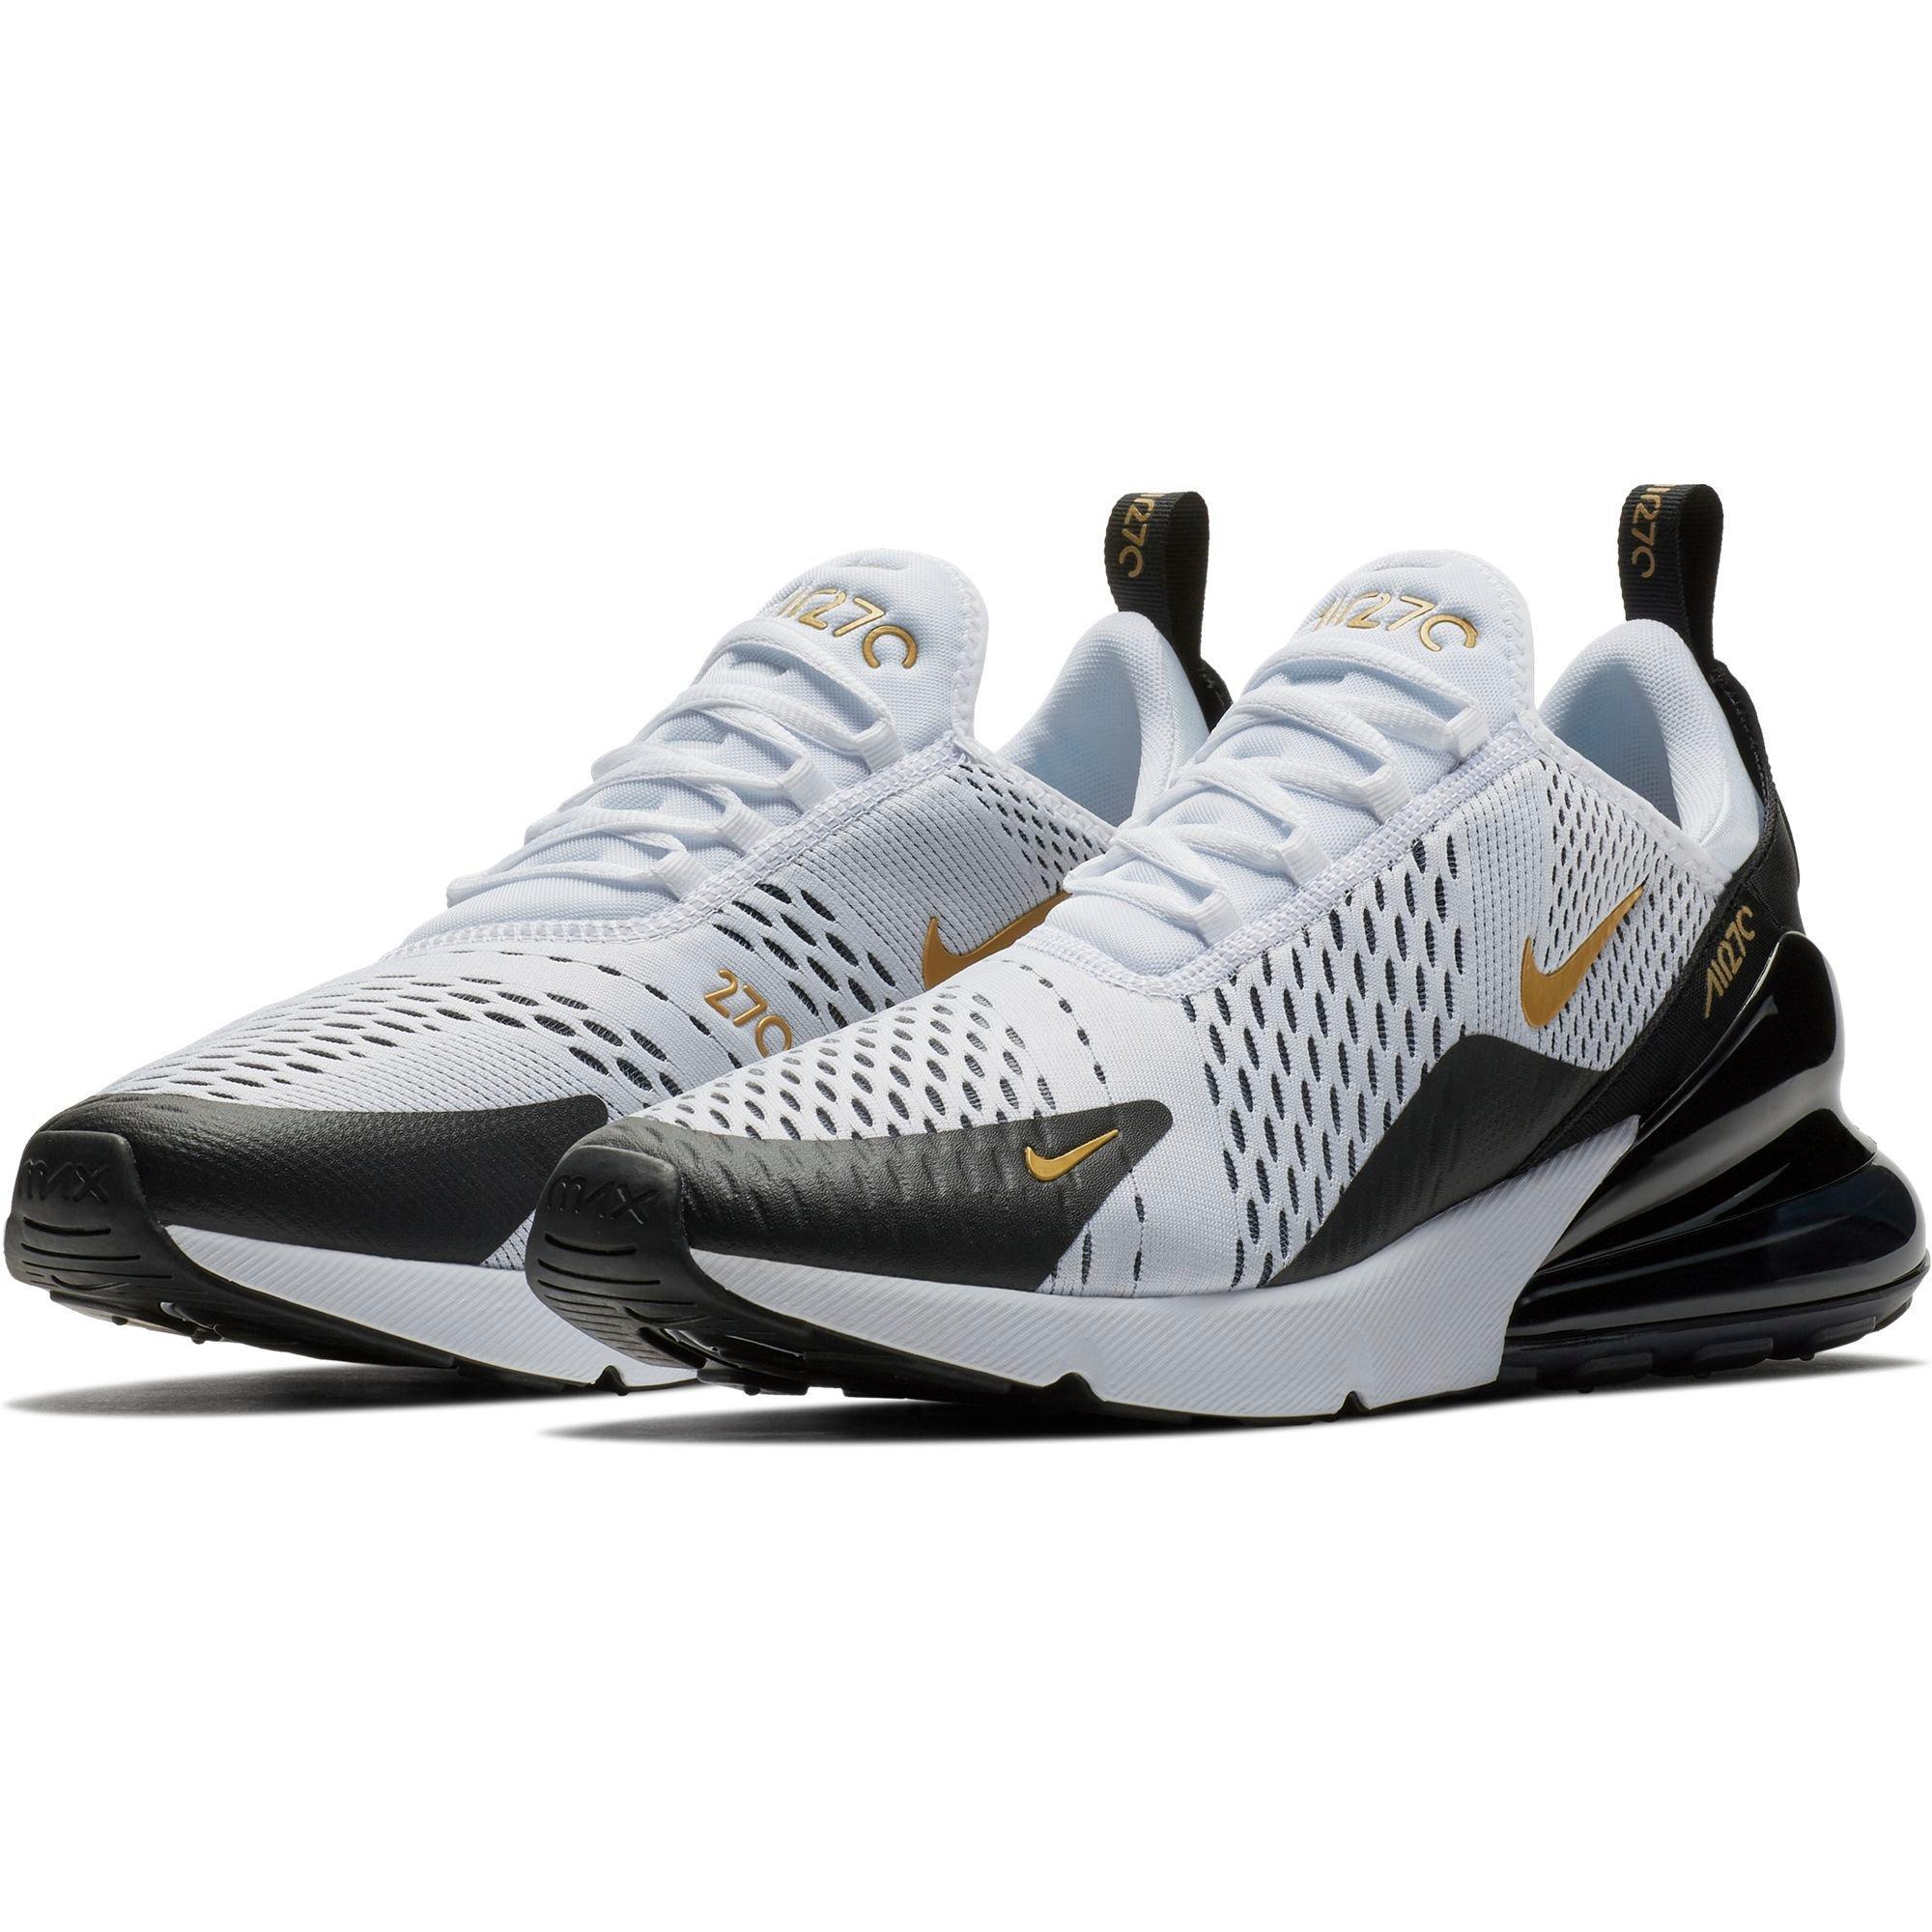 4034b52325 kellypriceandcompany.info | Nike Air Max 270 White Black Gold